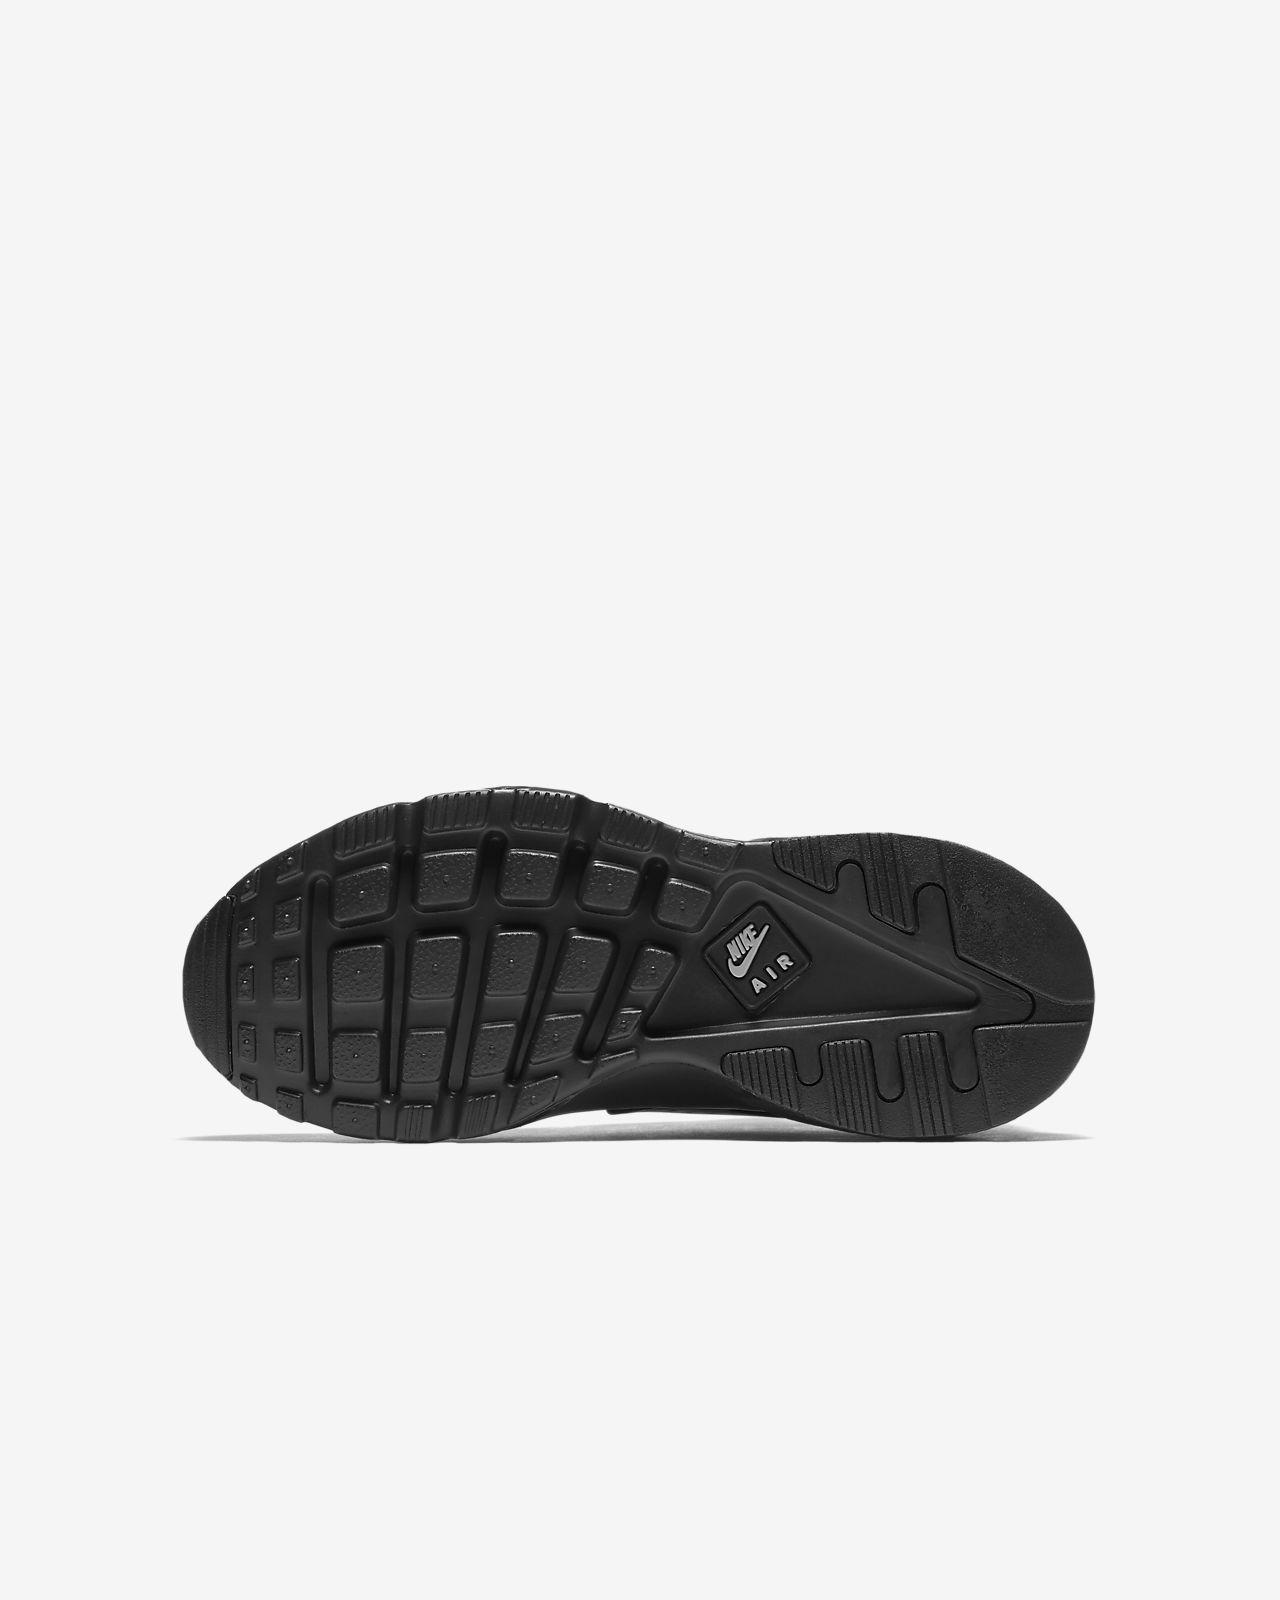 half off 3546e adecf ... Nike Air Huarache Ultra Older Kids  Shoe